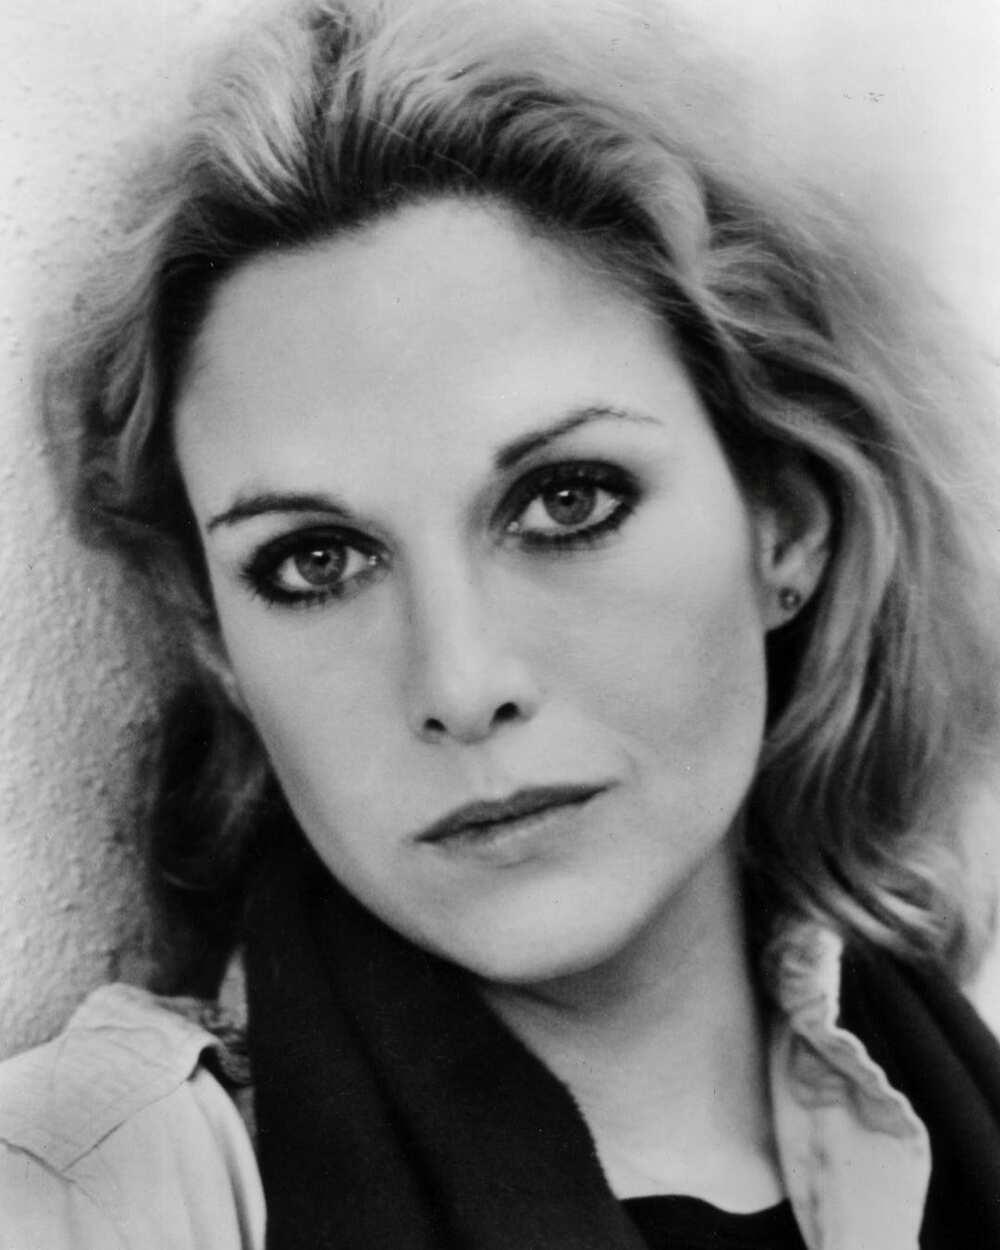 Actress Season Hubley now: bio, age, net worth, son